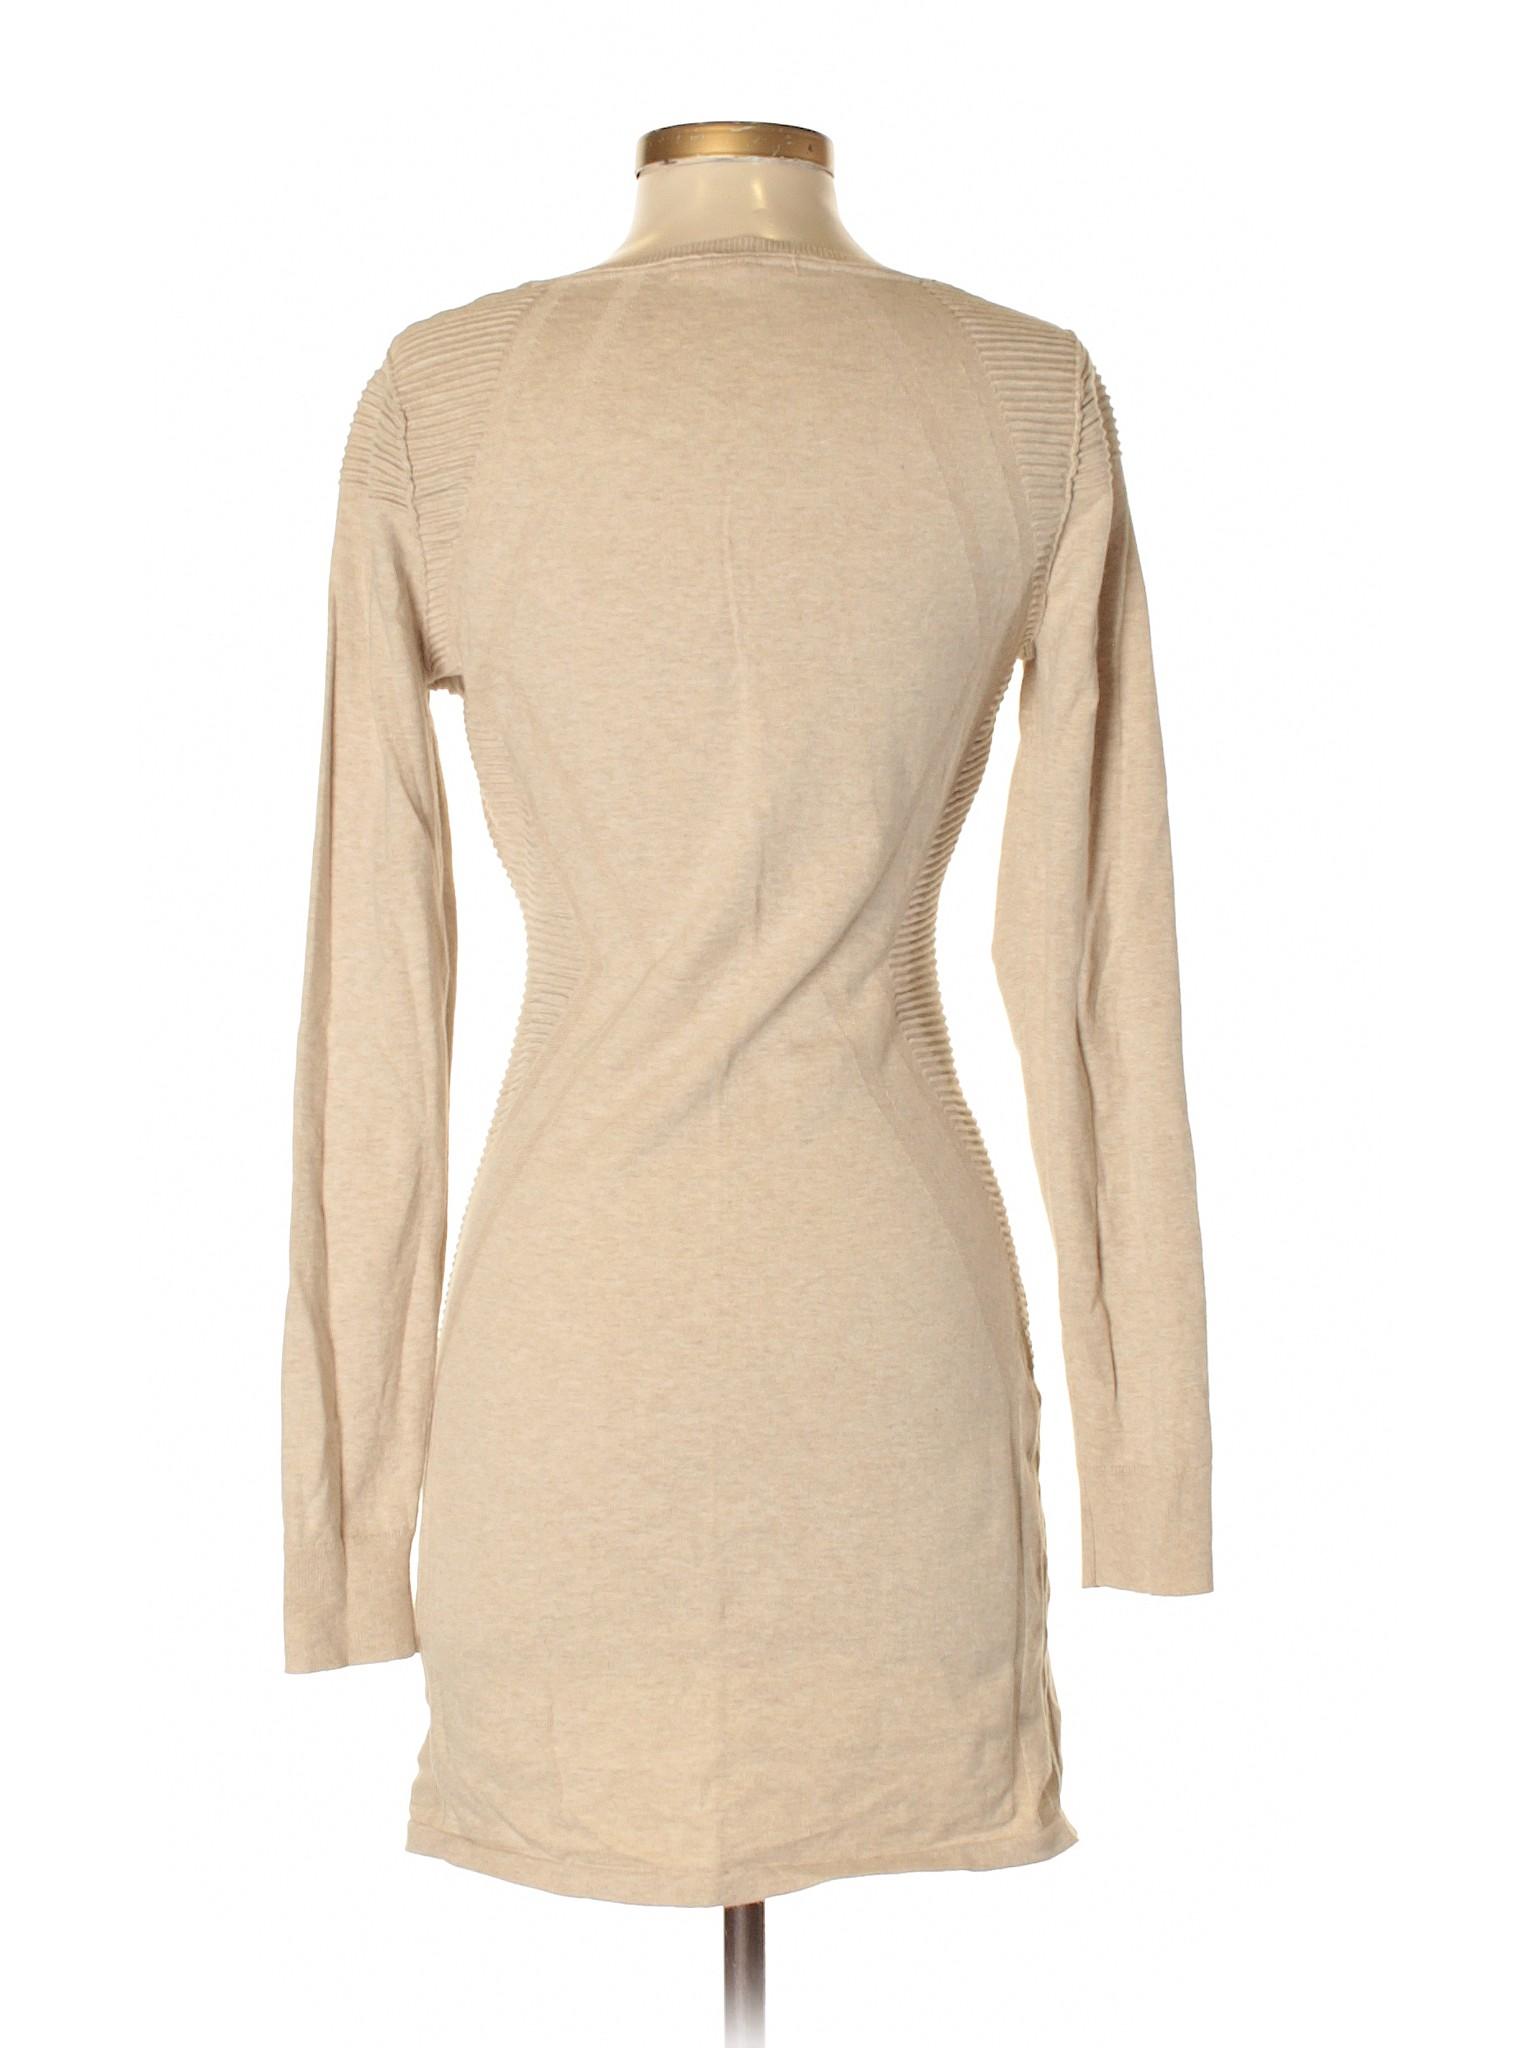 winter Boutique Casual Victoria's Secret Dress xAqZfq0vWd